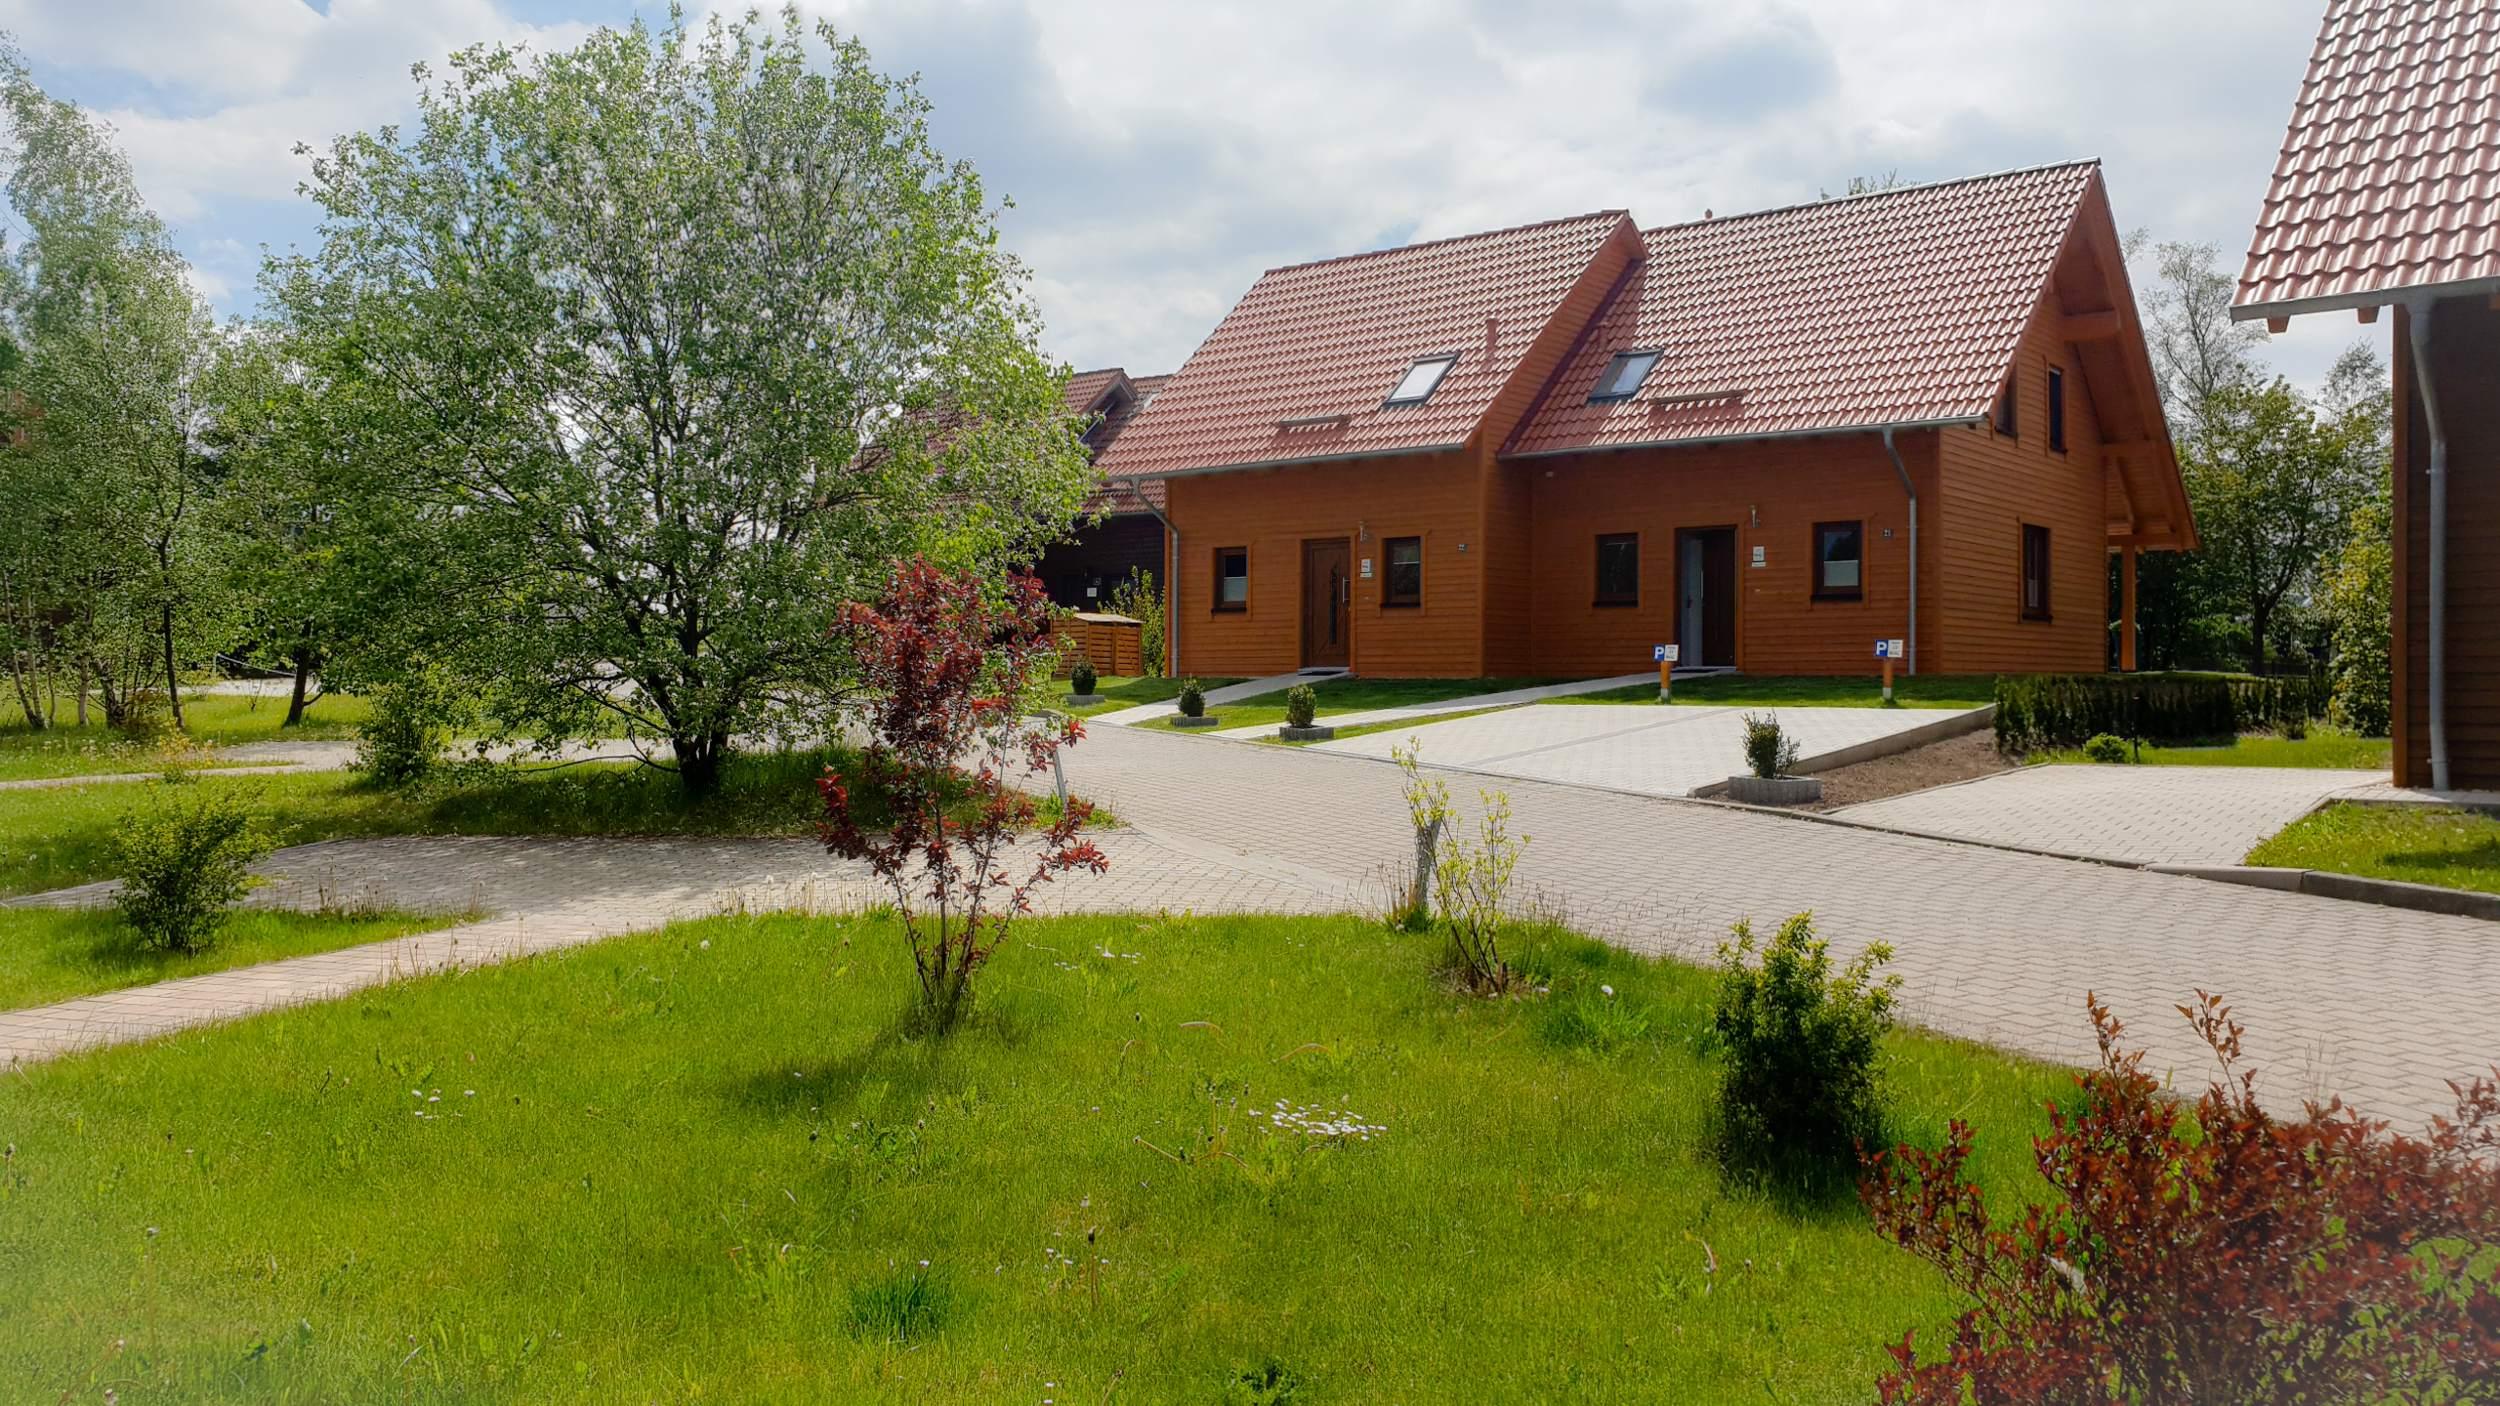 Ferienhäuser im Barbarossaweg Hasselfelde - Agena und Ankaa